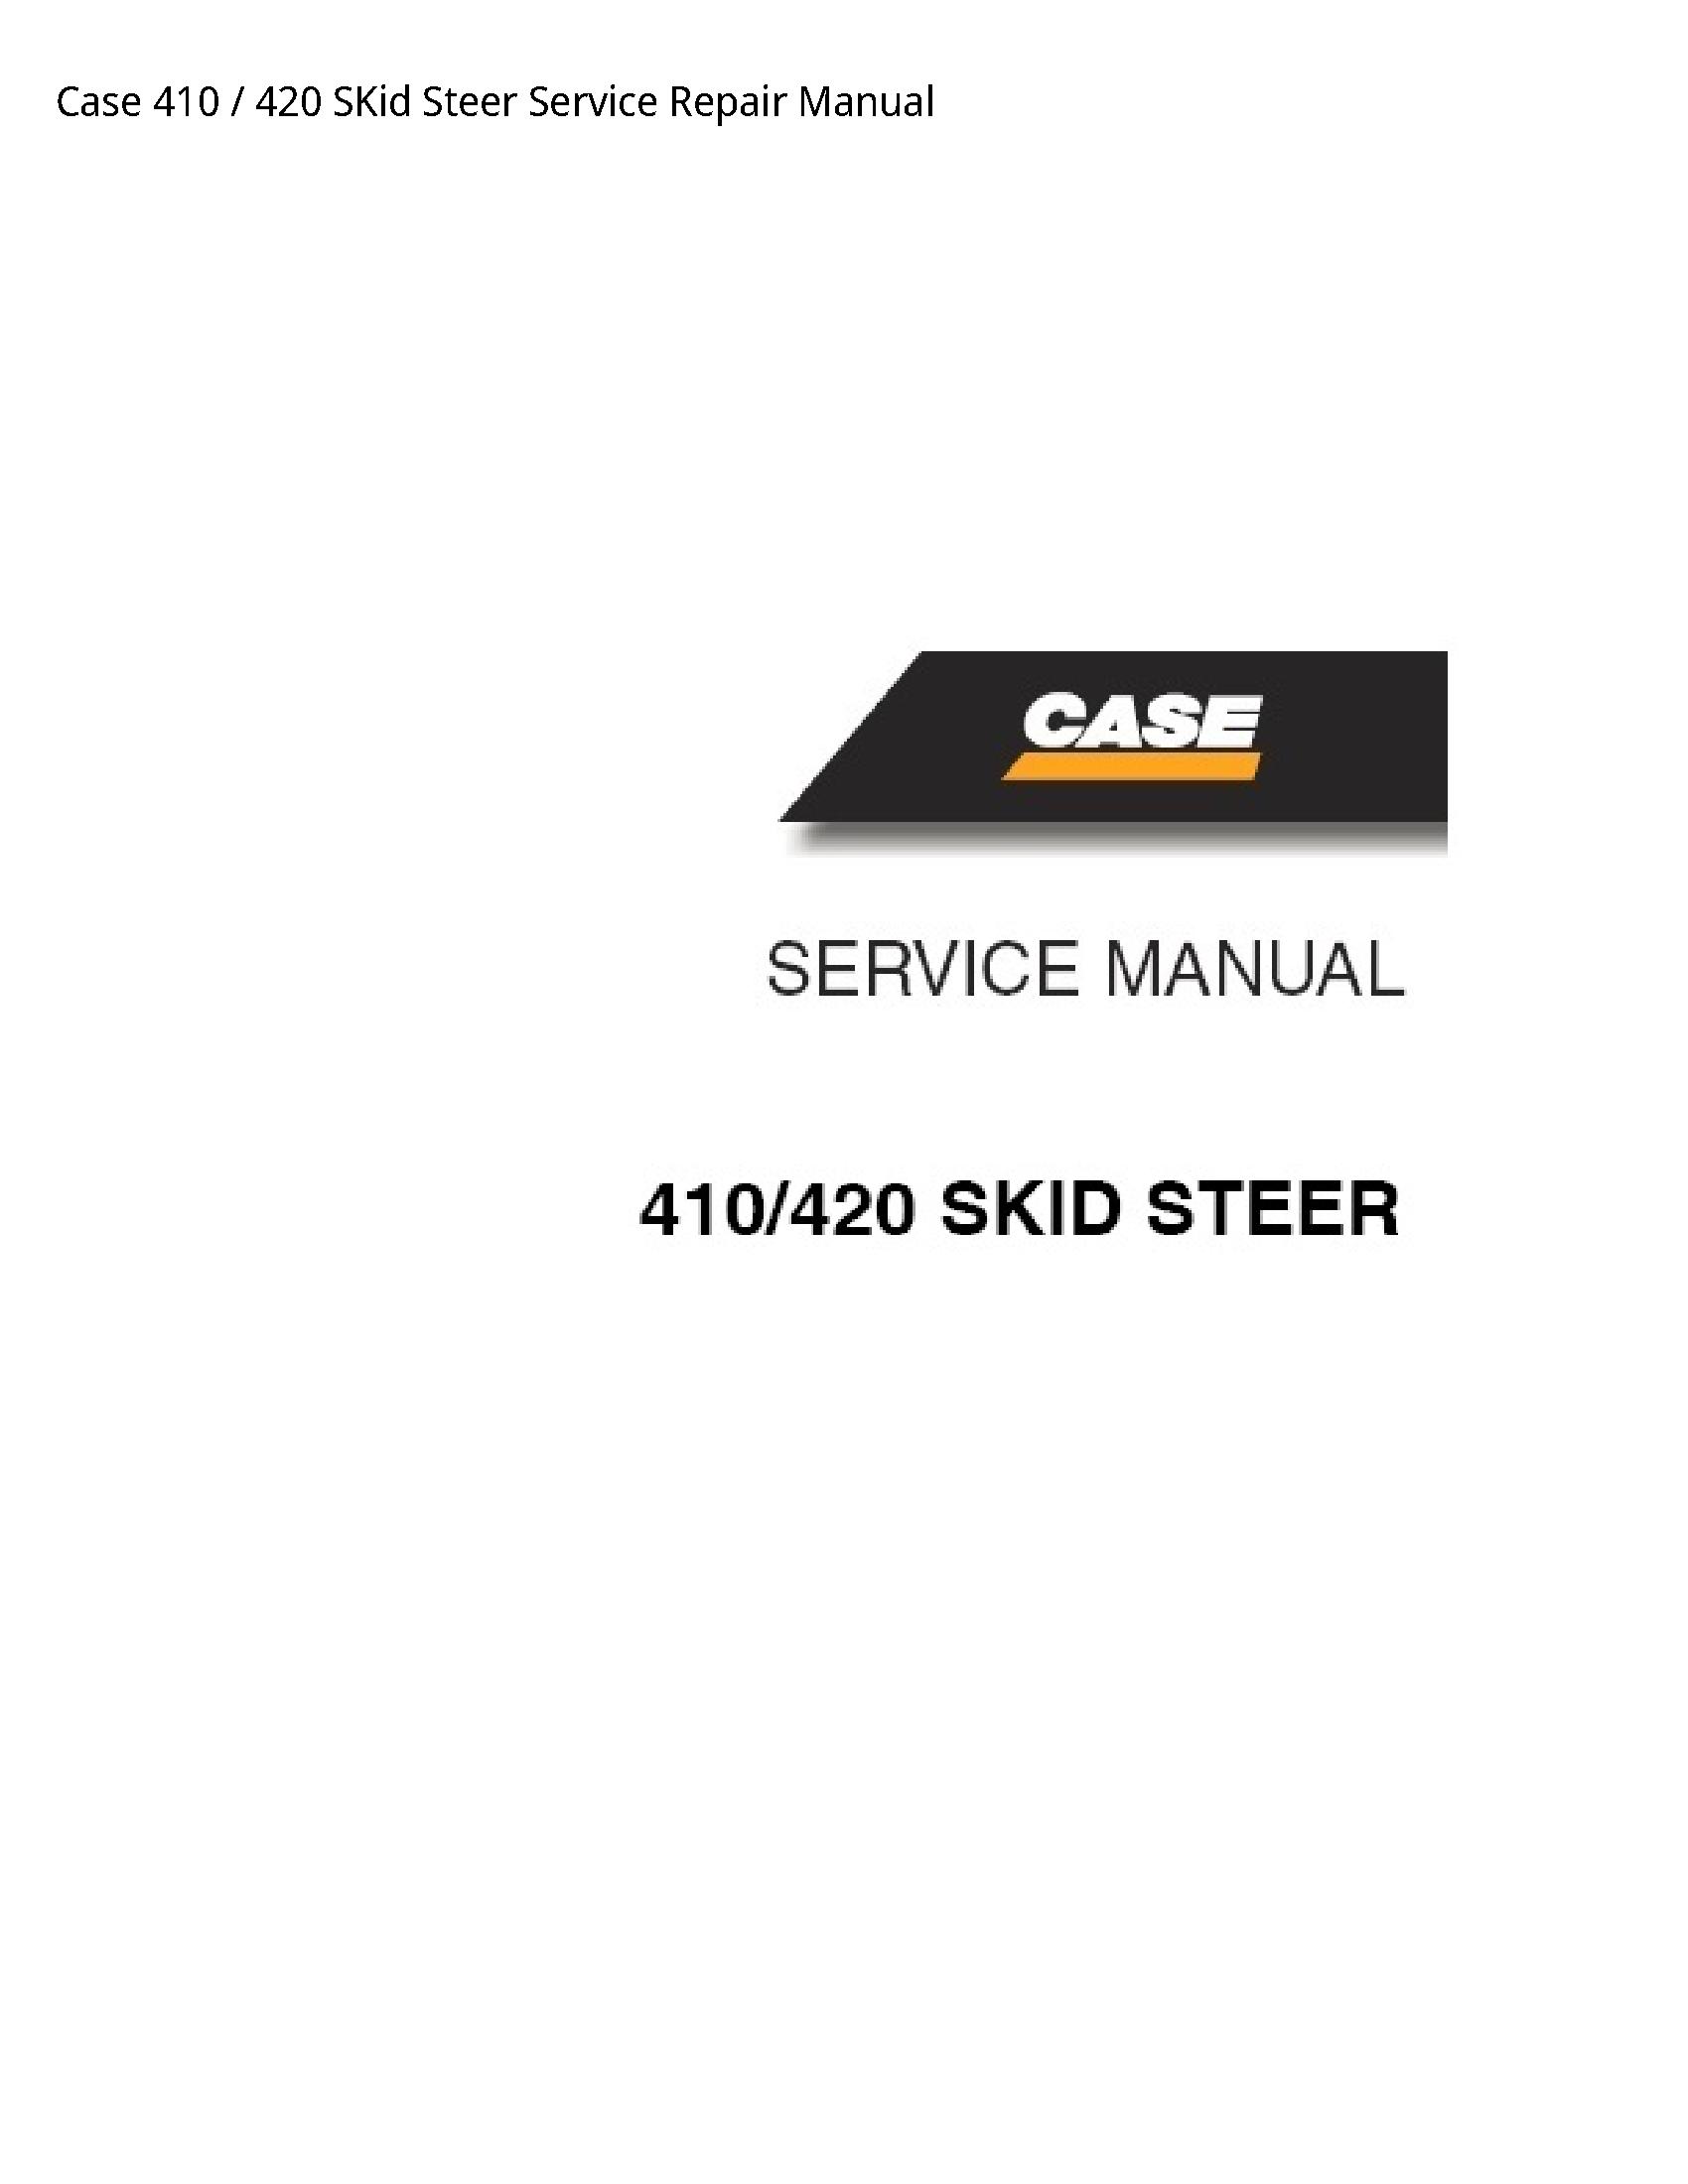 Case/Case IH 410 SKid Steer manual